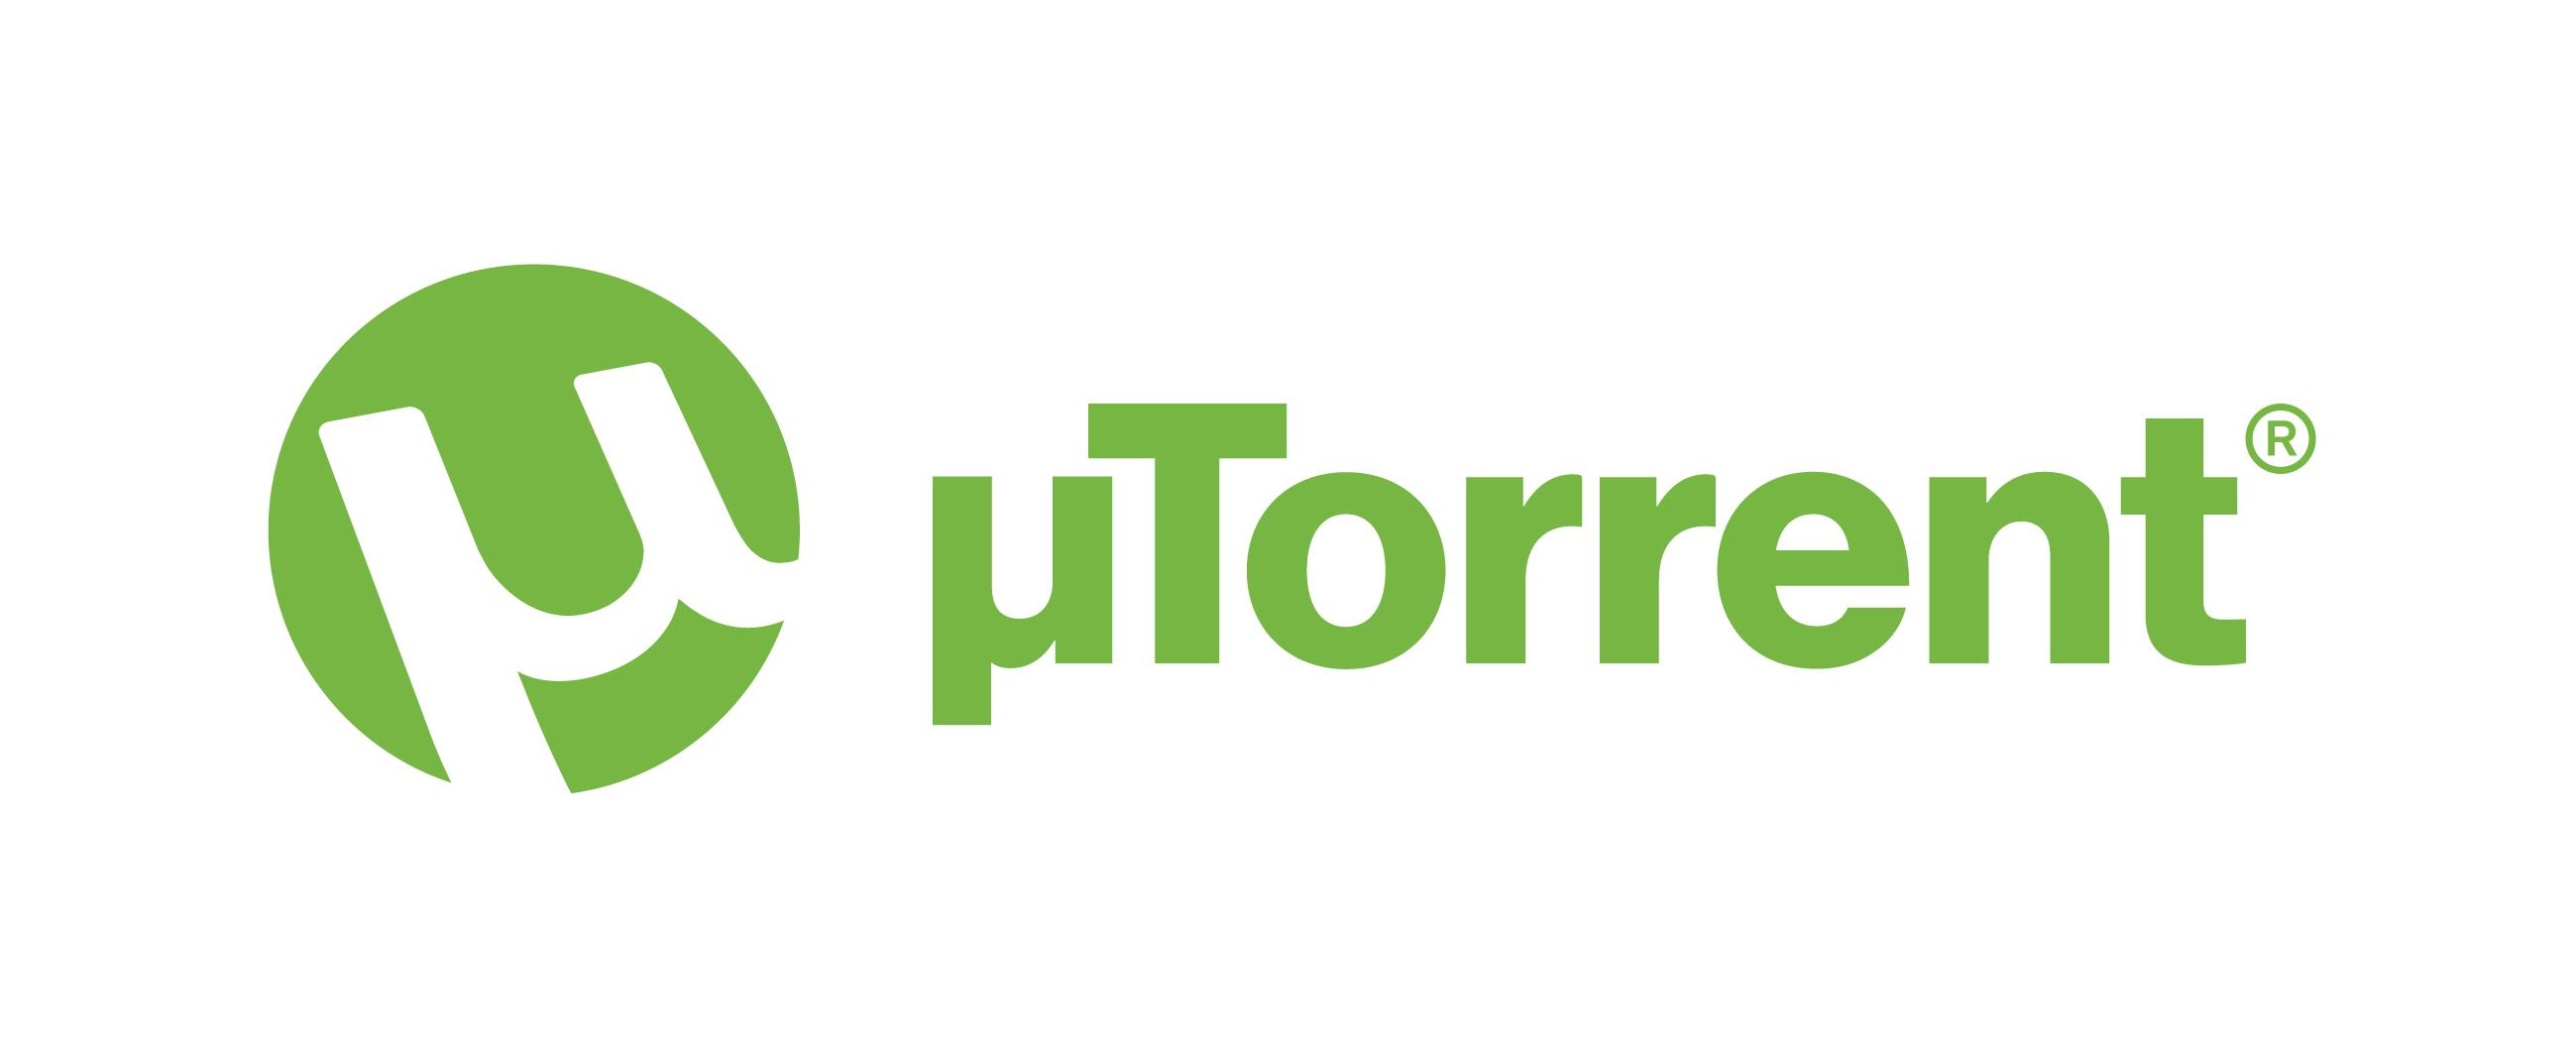 Utorrent has a dangerous security flaw afterdawn stopboris Gallery